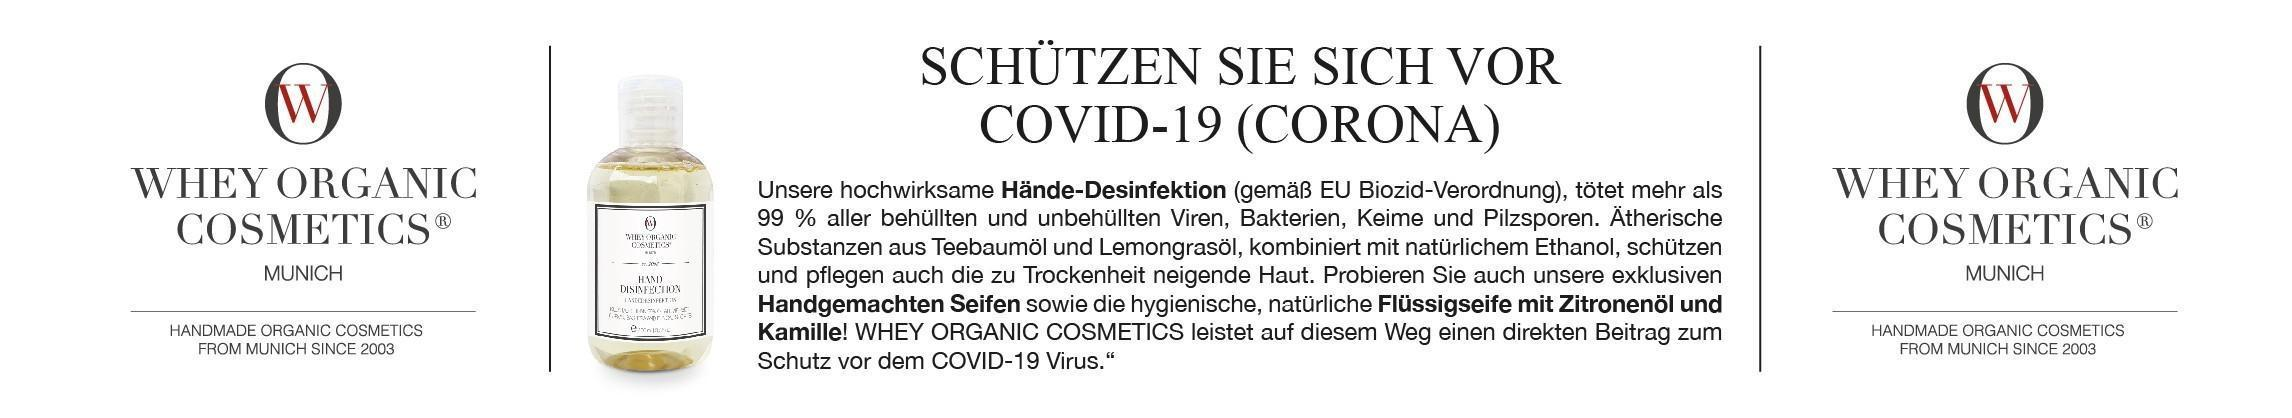 Whey_Organic_Coesmetics_Hand_Disinfection_Banner_COVID-19_DE